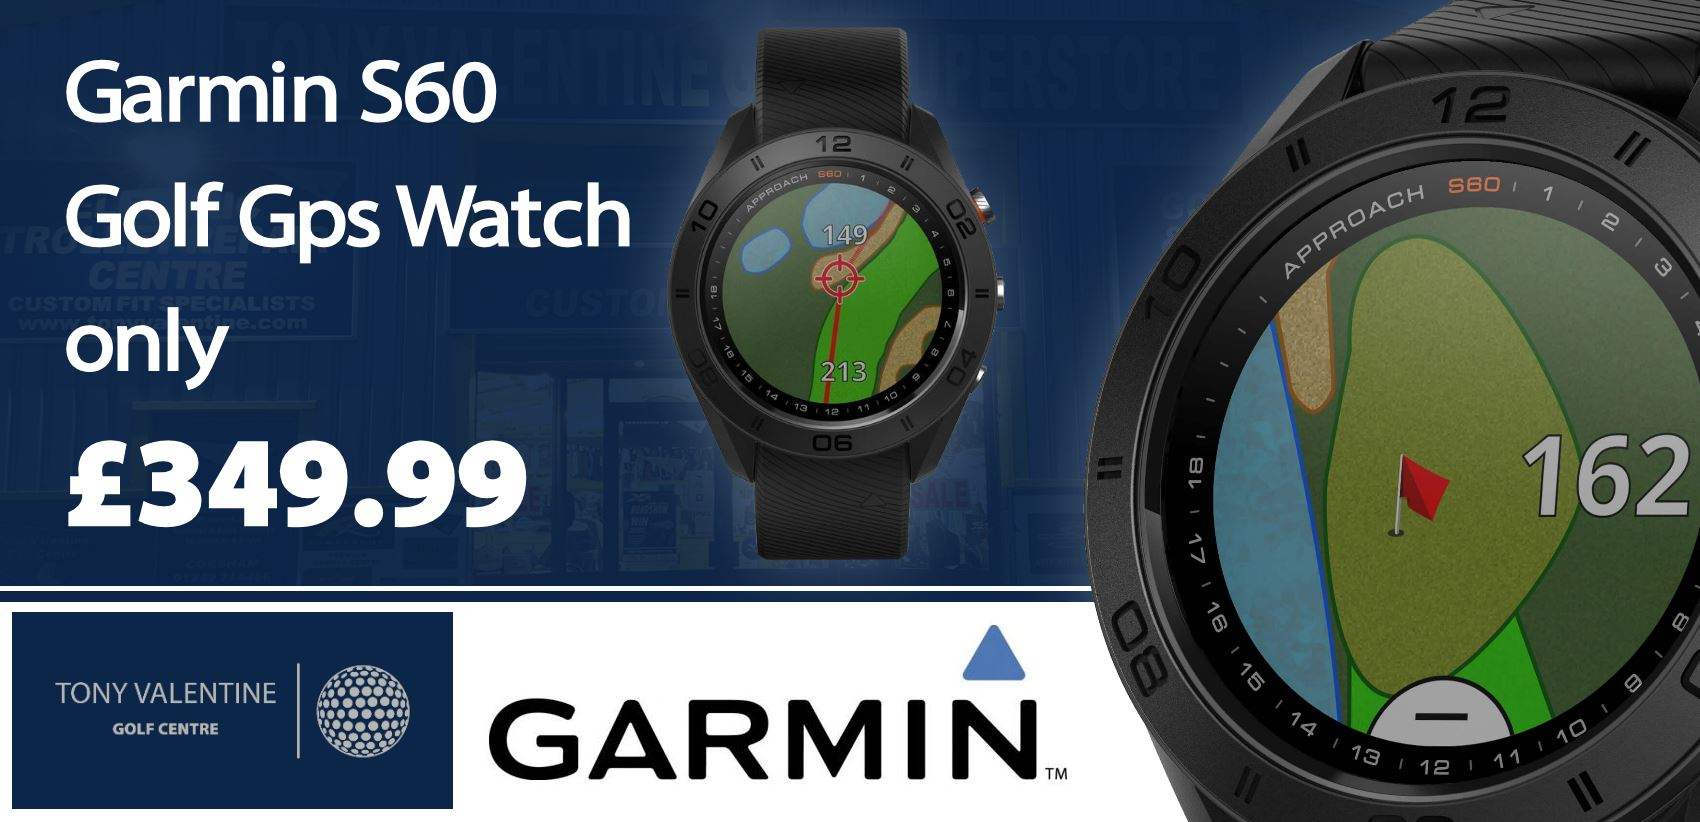 Garmin S60 Watch